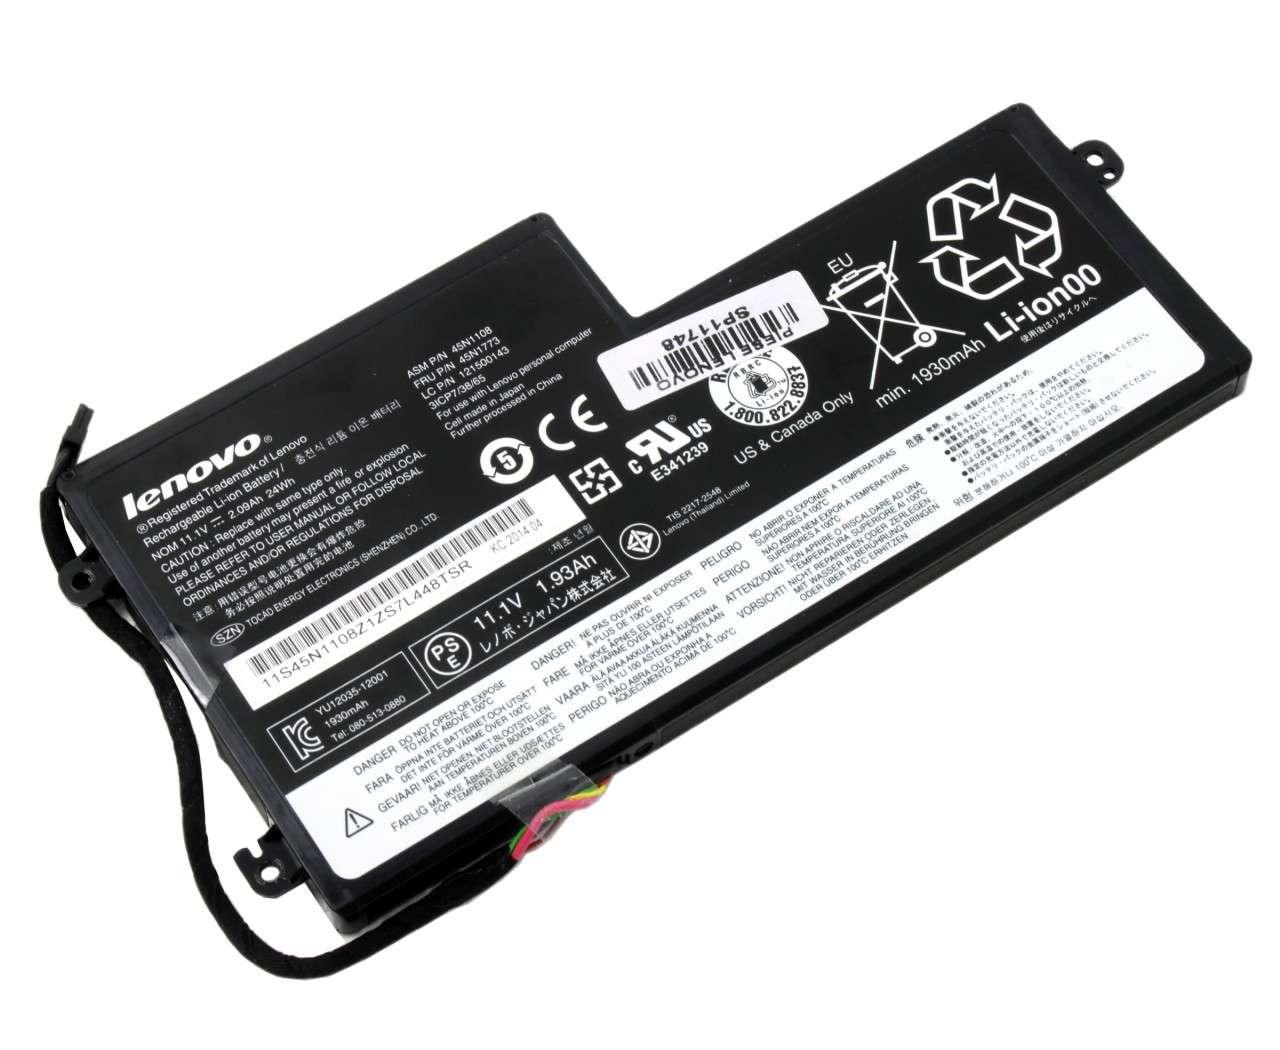 Baterie Lenovo ThinkPad X240s Originala 24Wh imagine powerlaptop.ro 2021